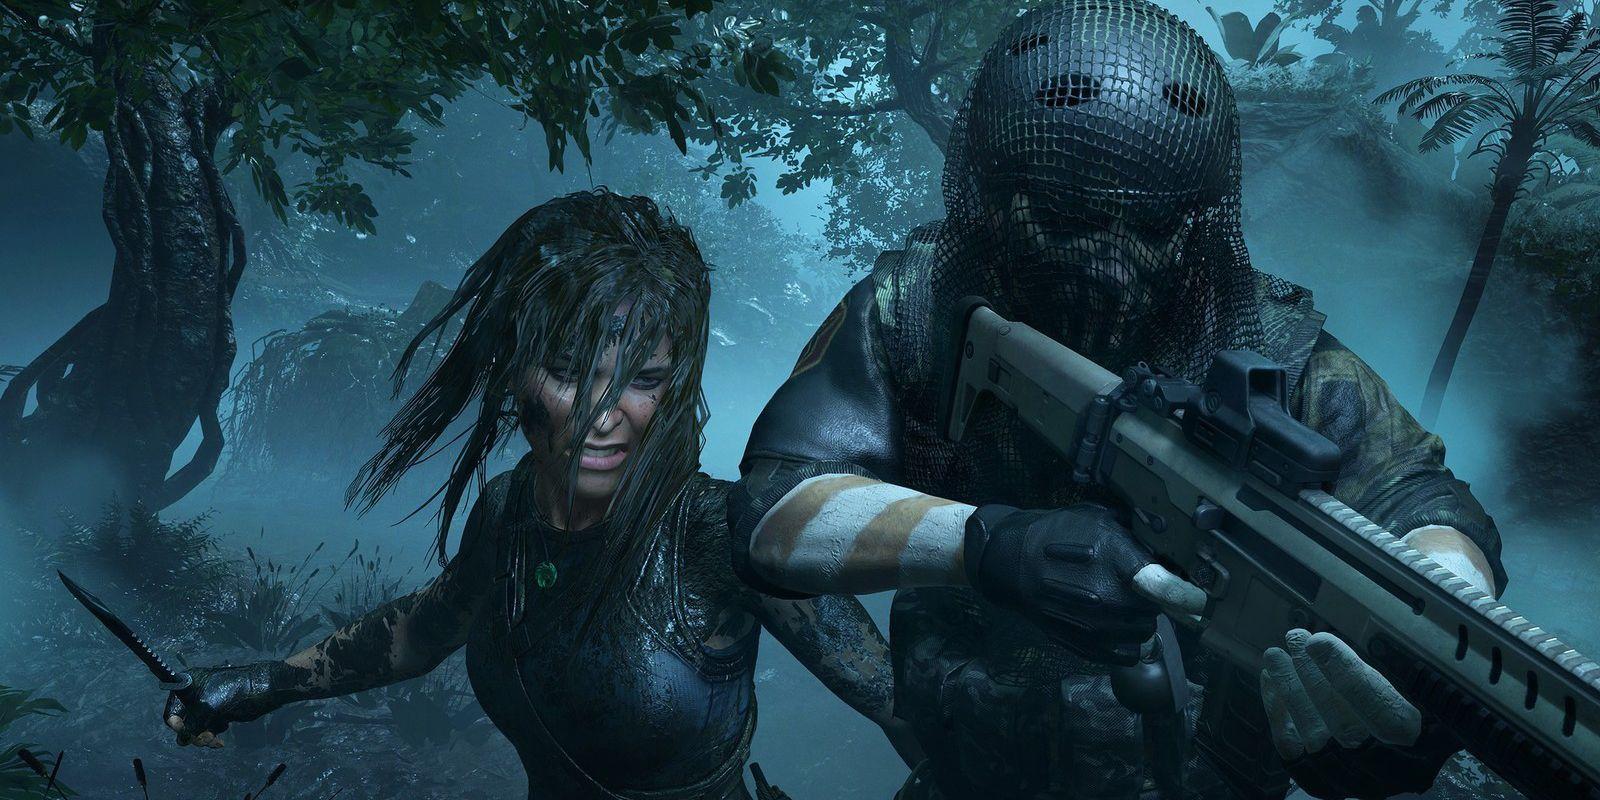 https://static3.srcdn.com/wordpress/wp-content/uploads/2018/09/Shadow-of-the-Tomb-Raider-Stealth-Attack.jpg